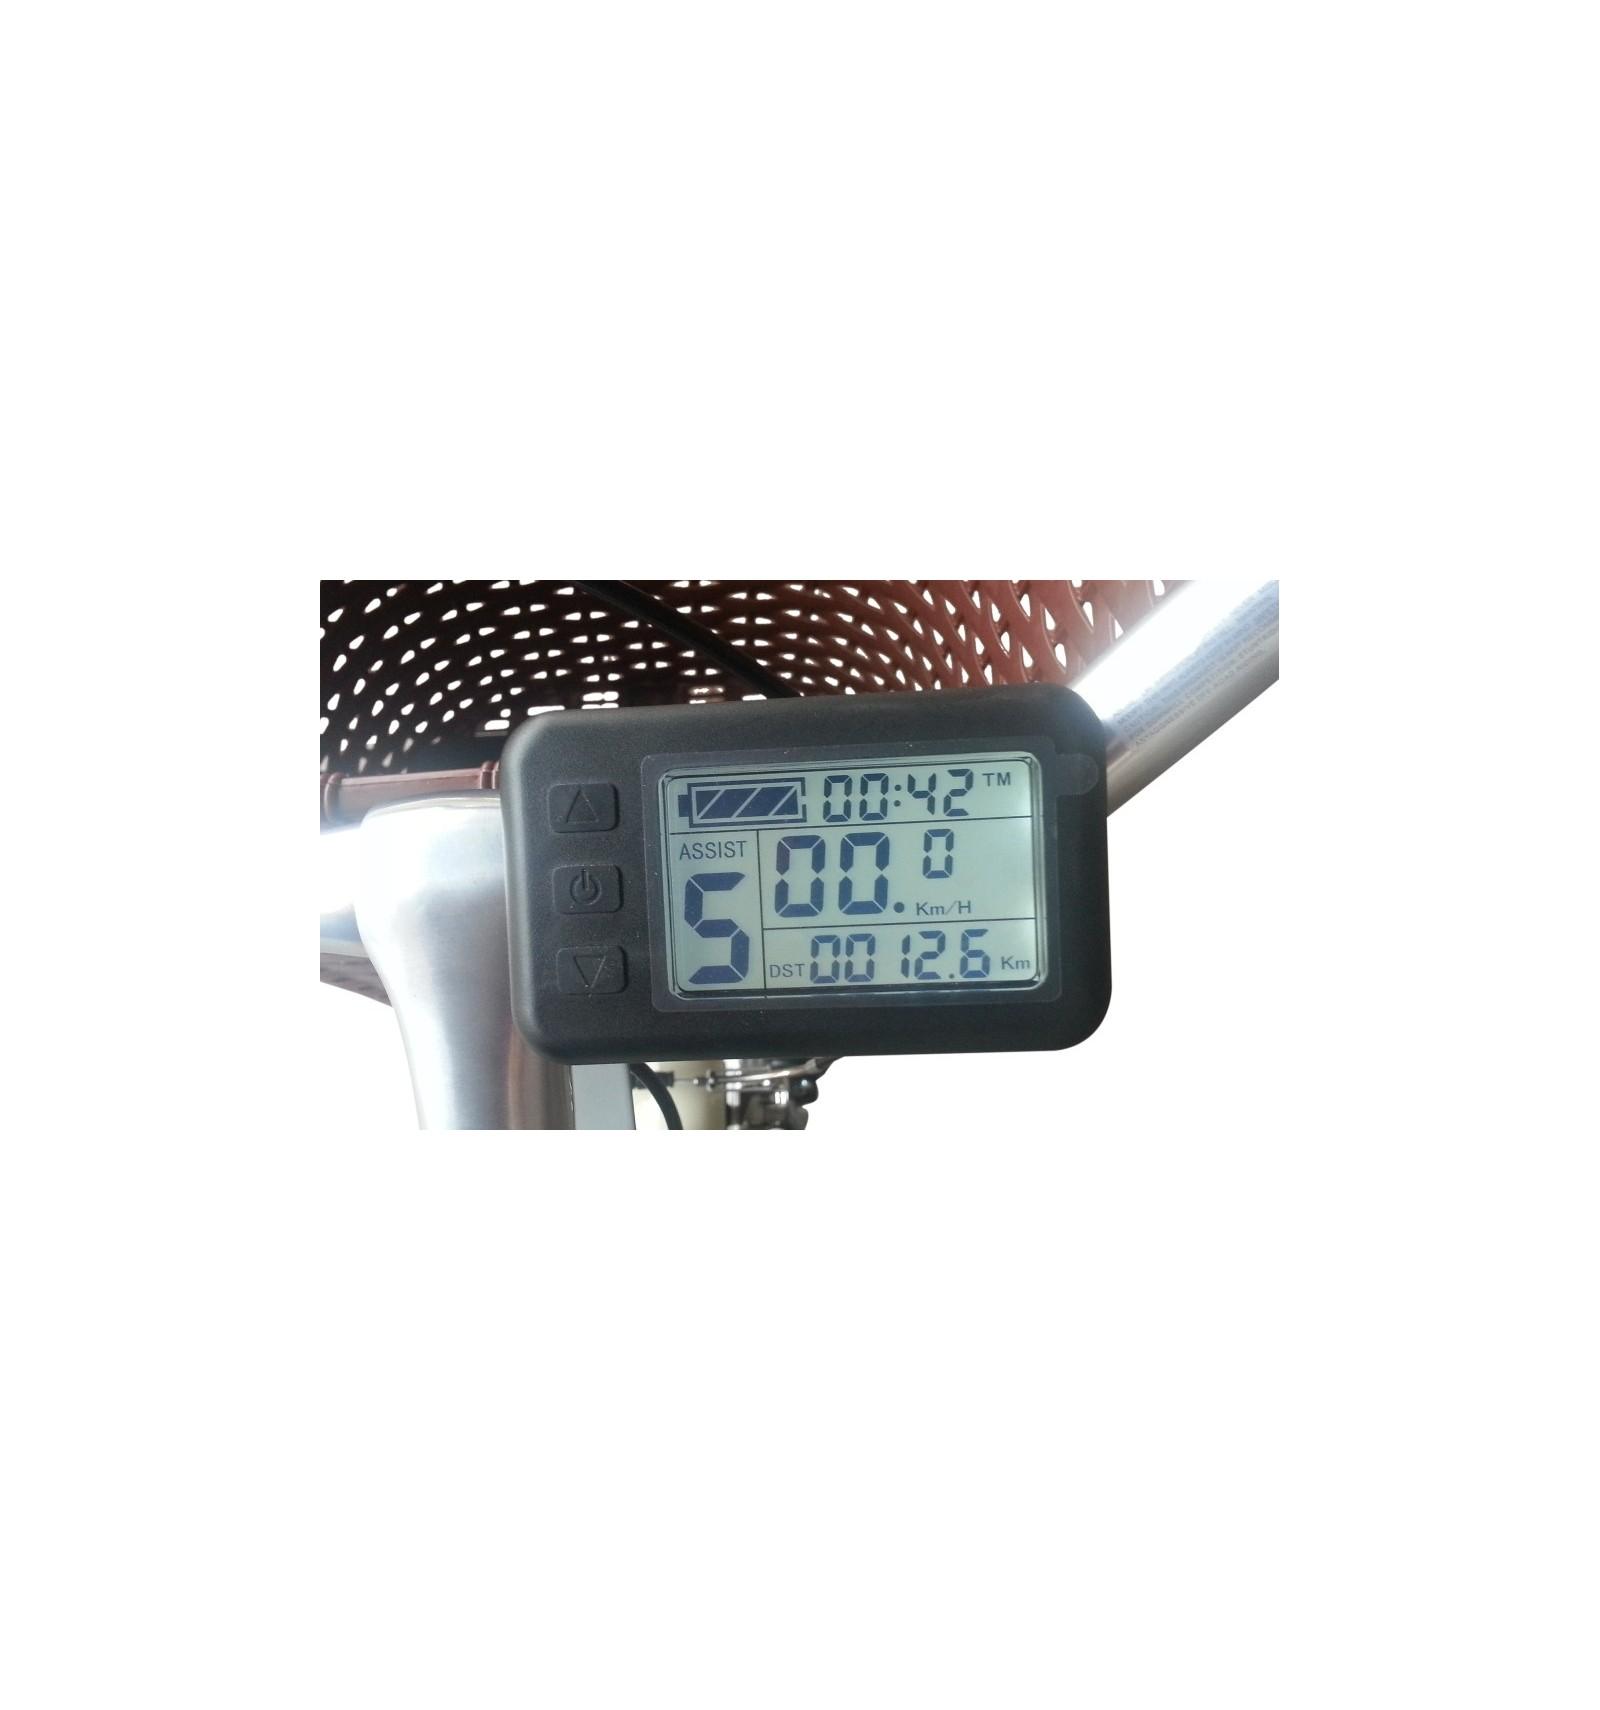 #6B433C Mest effektive Gør Det Selv Elcykel Kit Til Christiania Ladcykel Gør Det Selv El Cykel 5135 160017105135